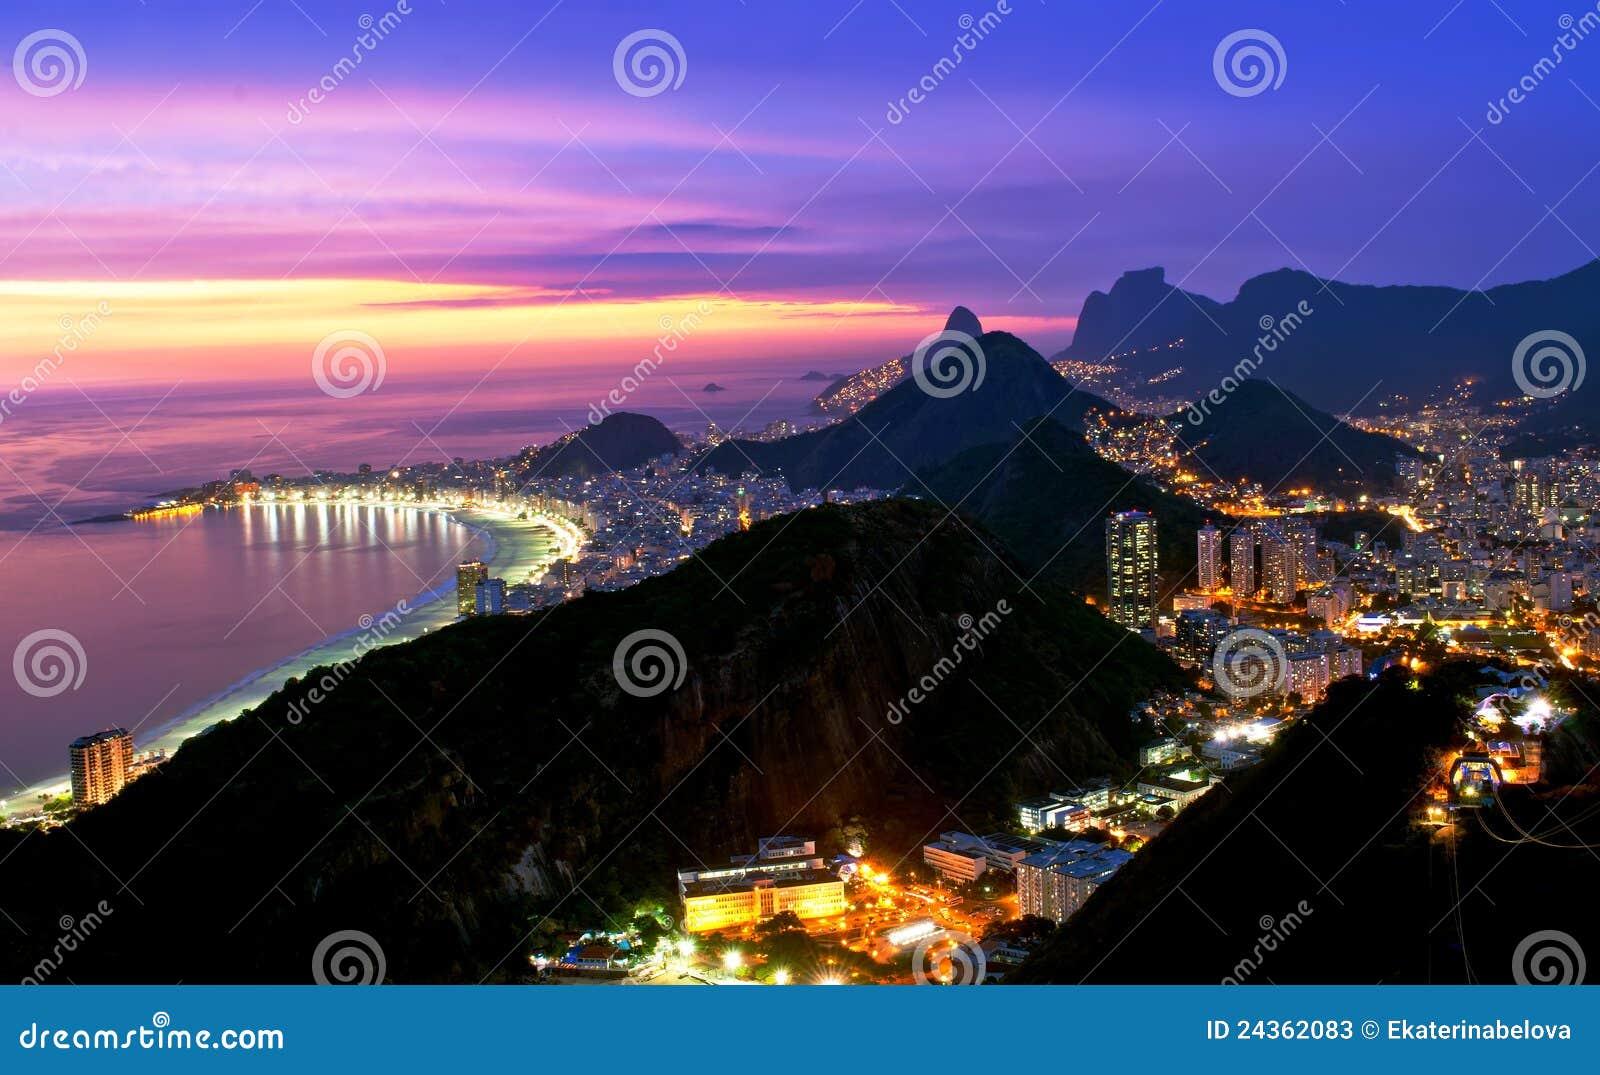 Night view of Copacabana beach and Botafogo in Rio